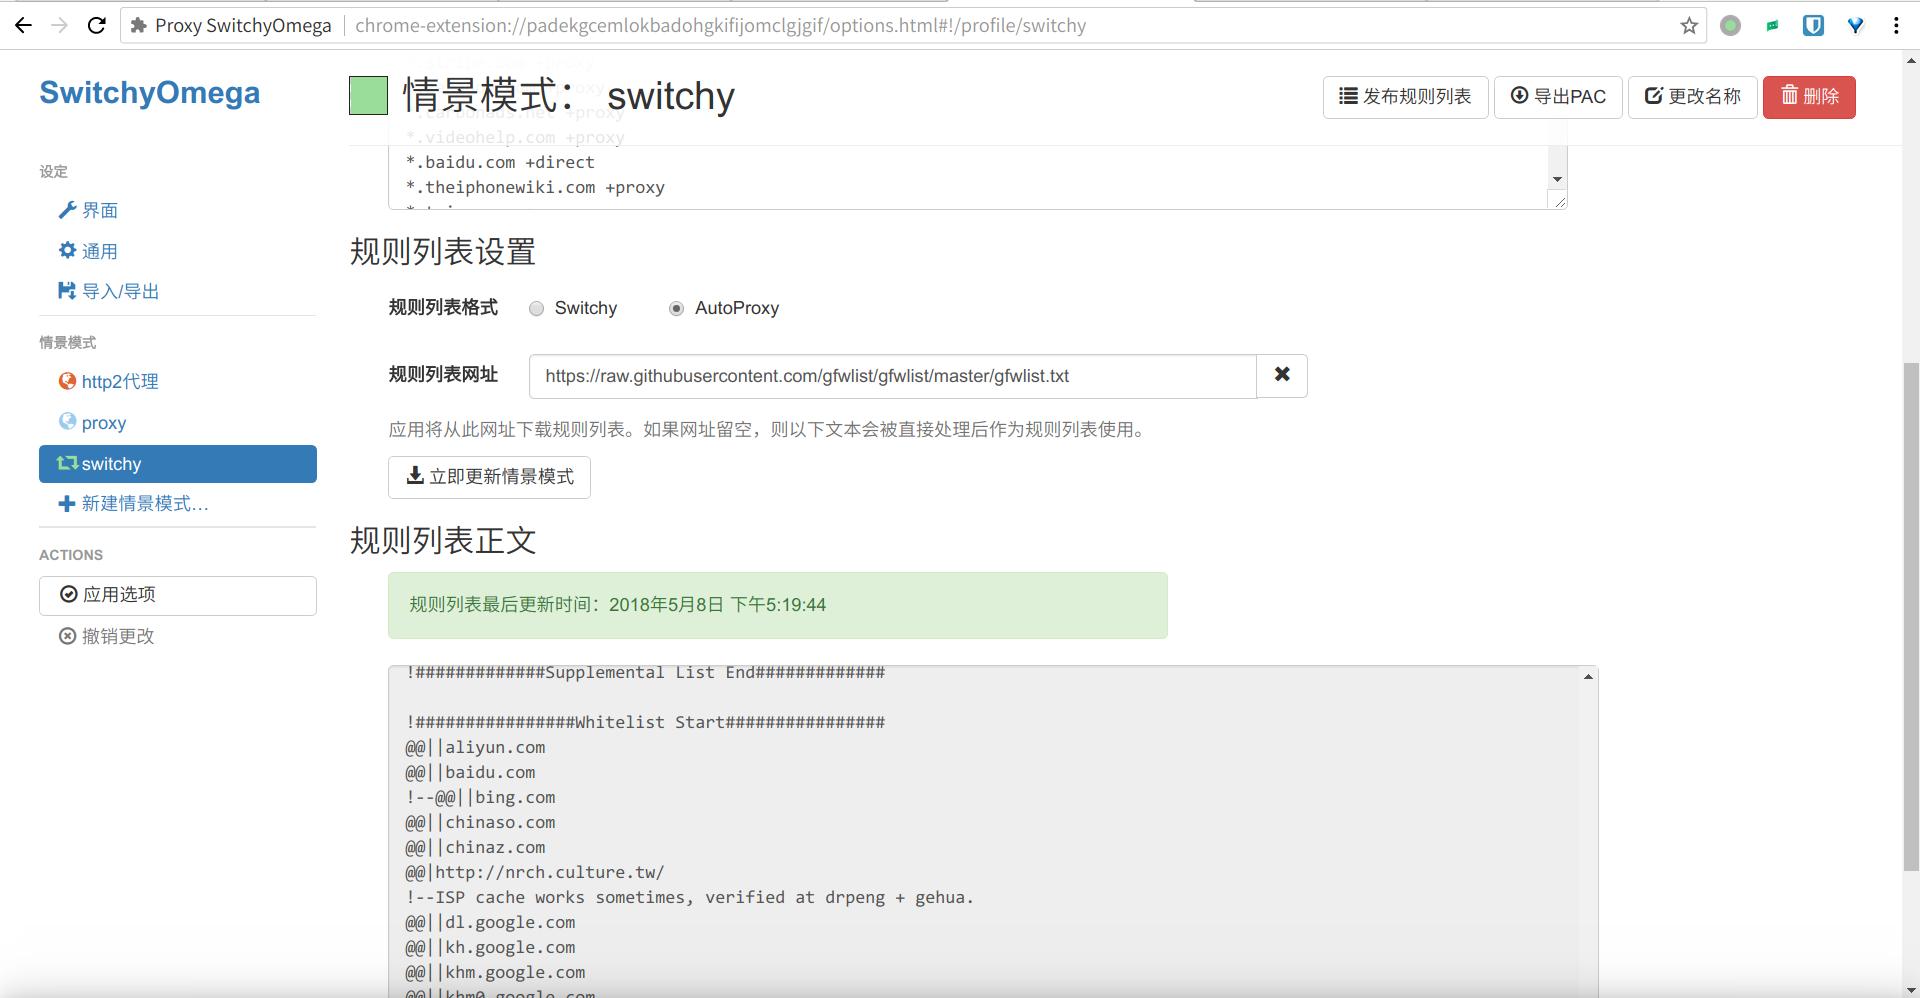 SwitchyOmega 自动切换模式下Chrome 无法登陆谷歌账户· Issue #1056